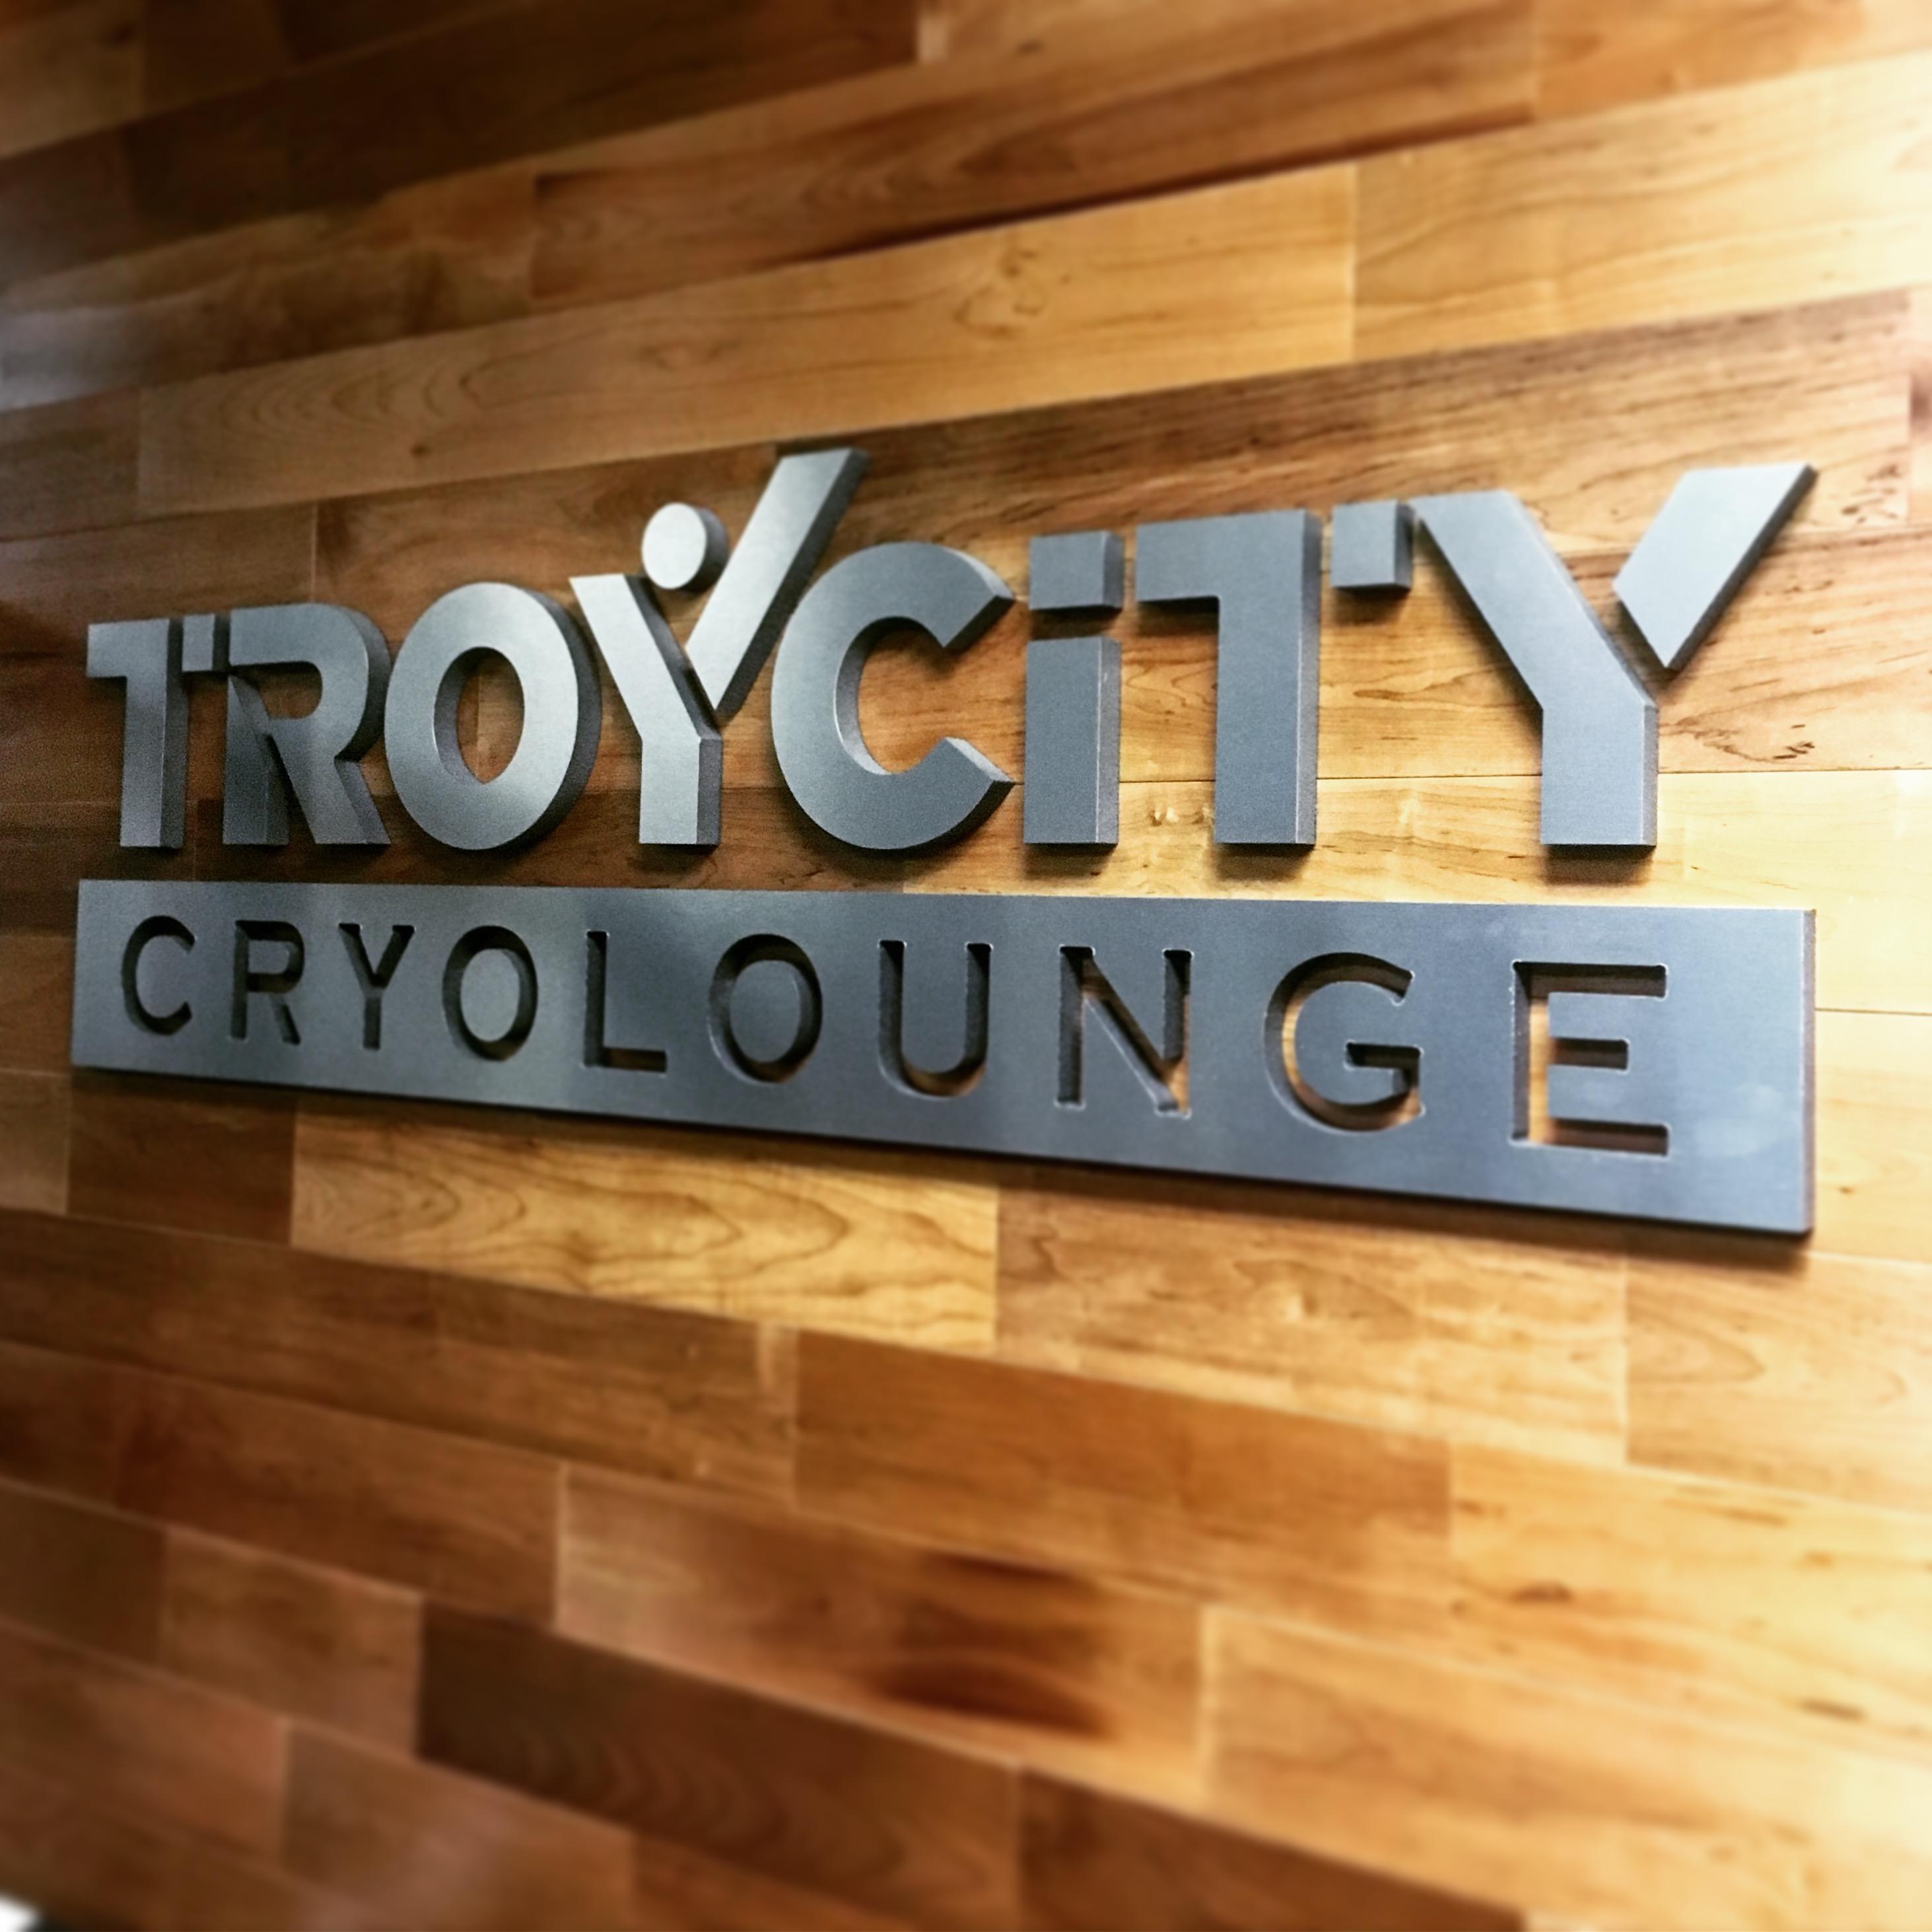 Troy City Cryolounge